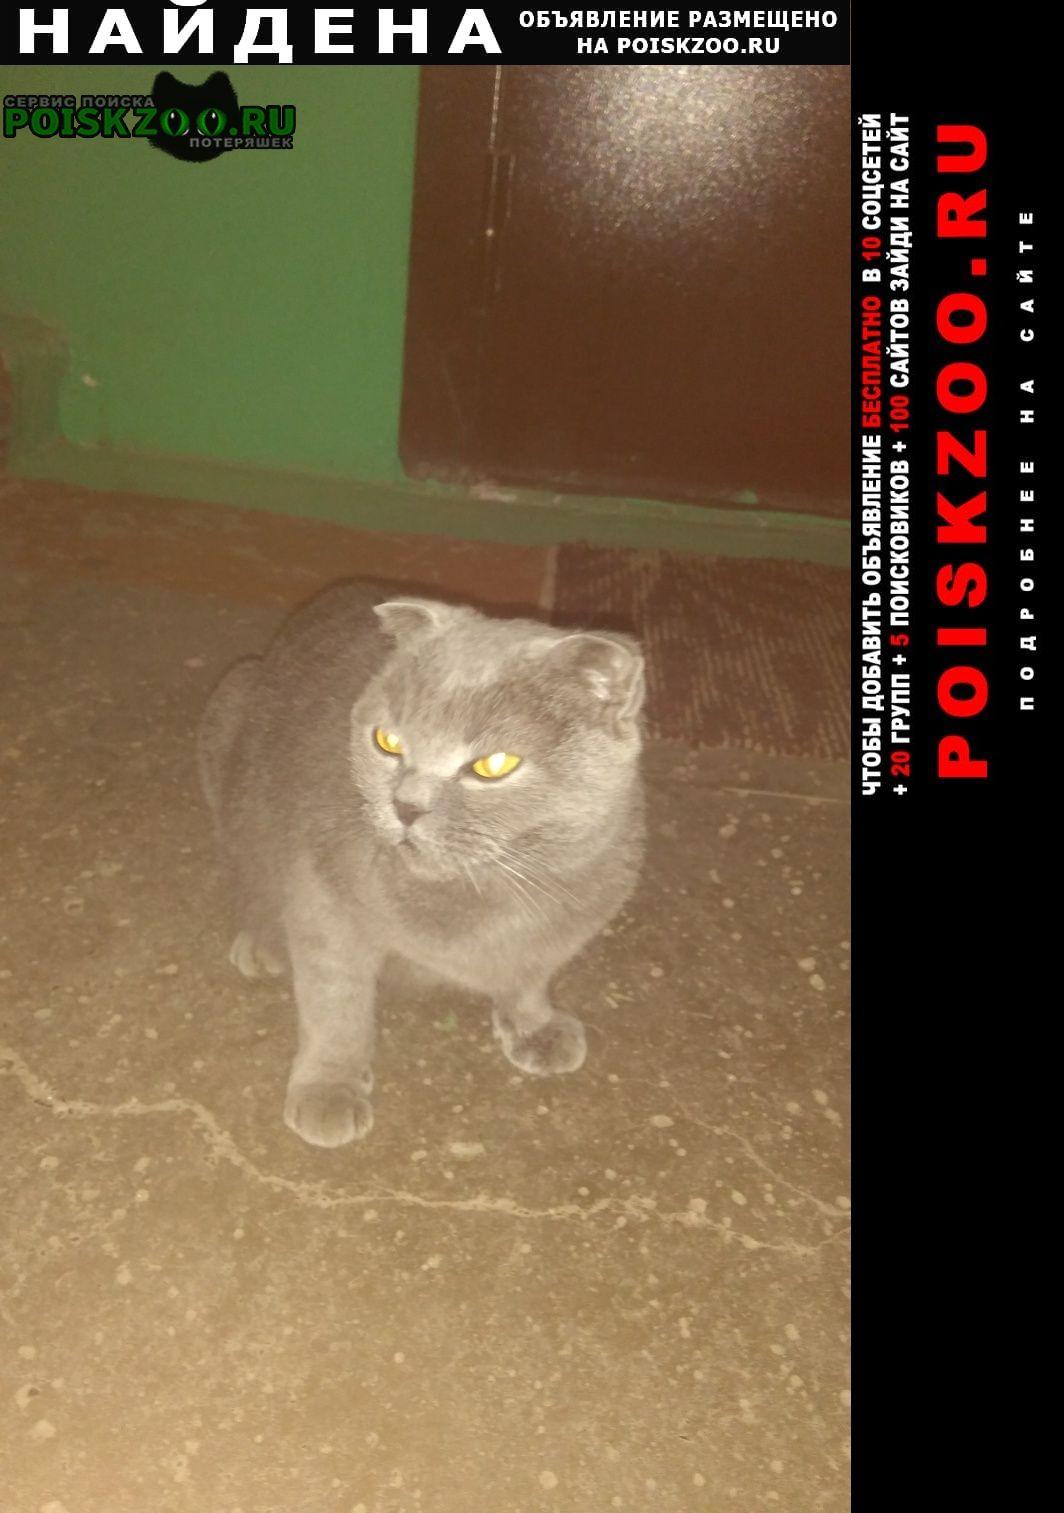 Найдена кошка прибилась кошечка. Дзержинск